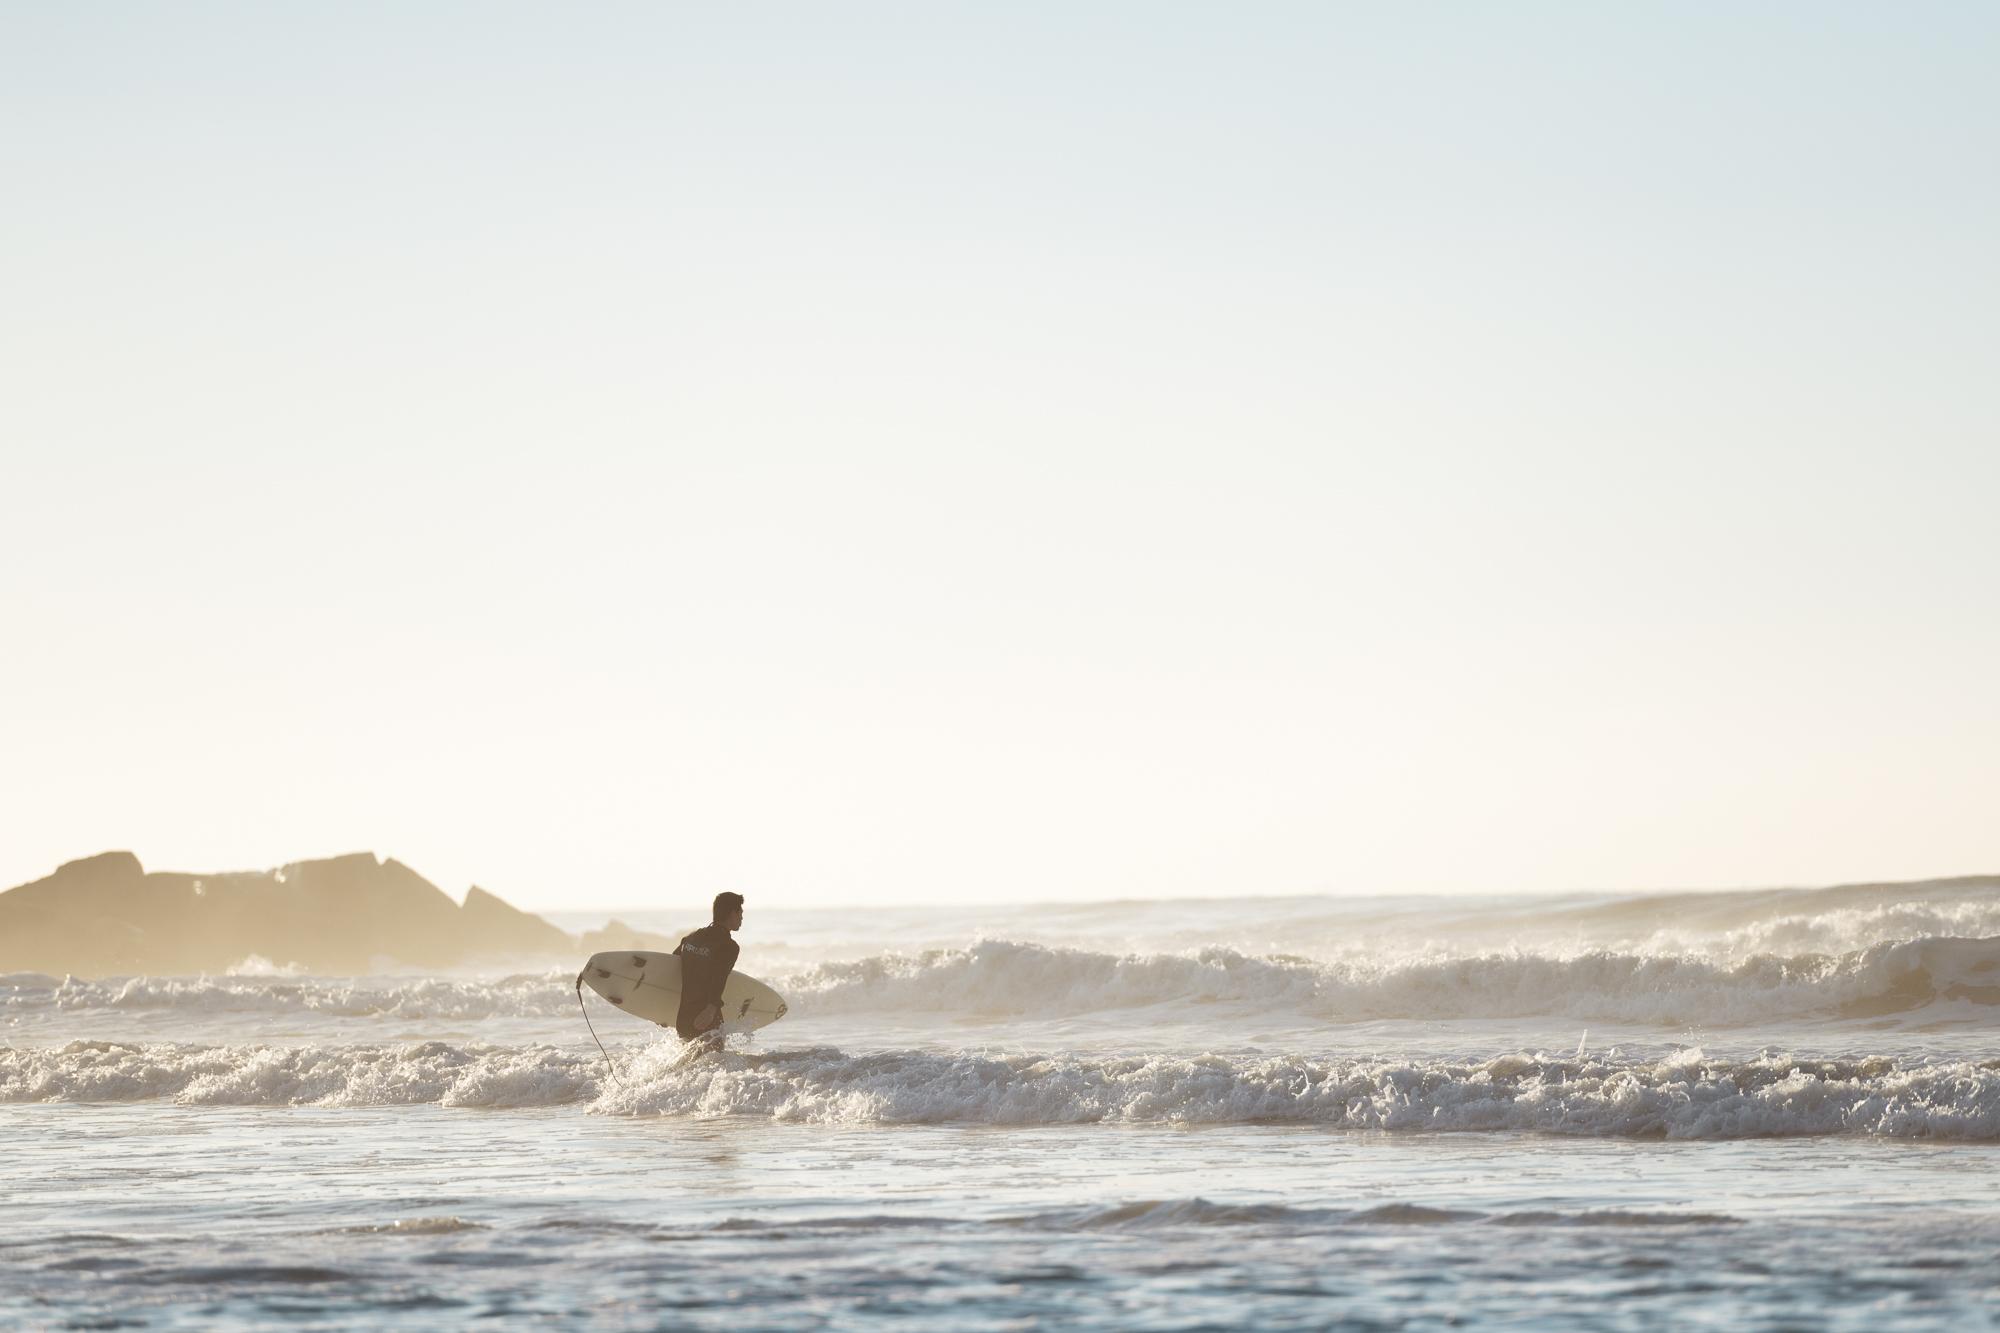 180915_Surfing Rockaway Beach_8504522-Bearbeitet.jpg